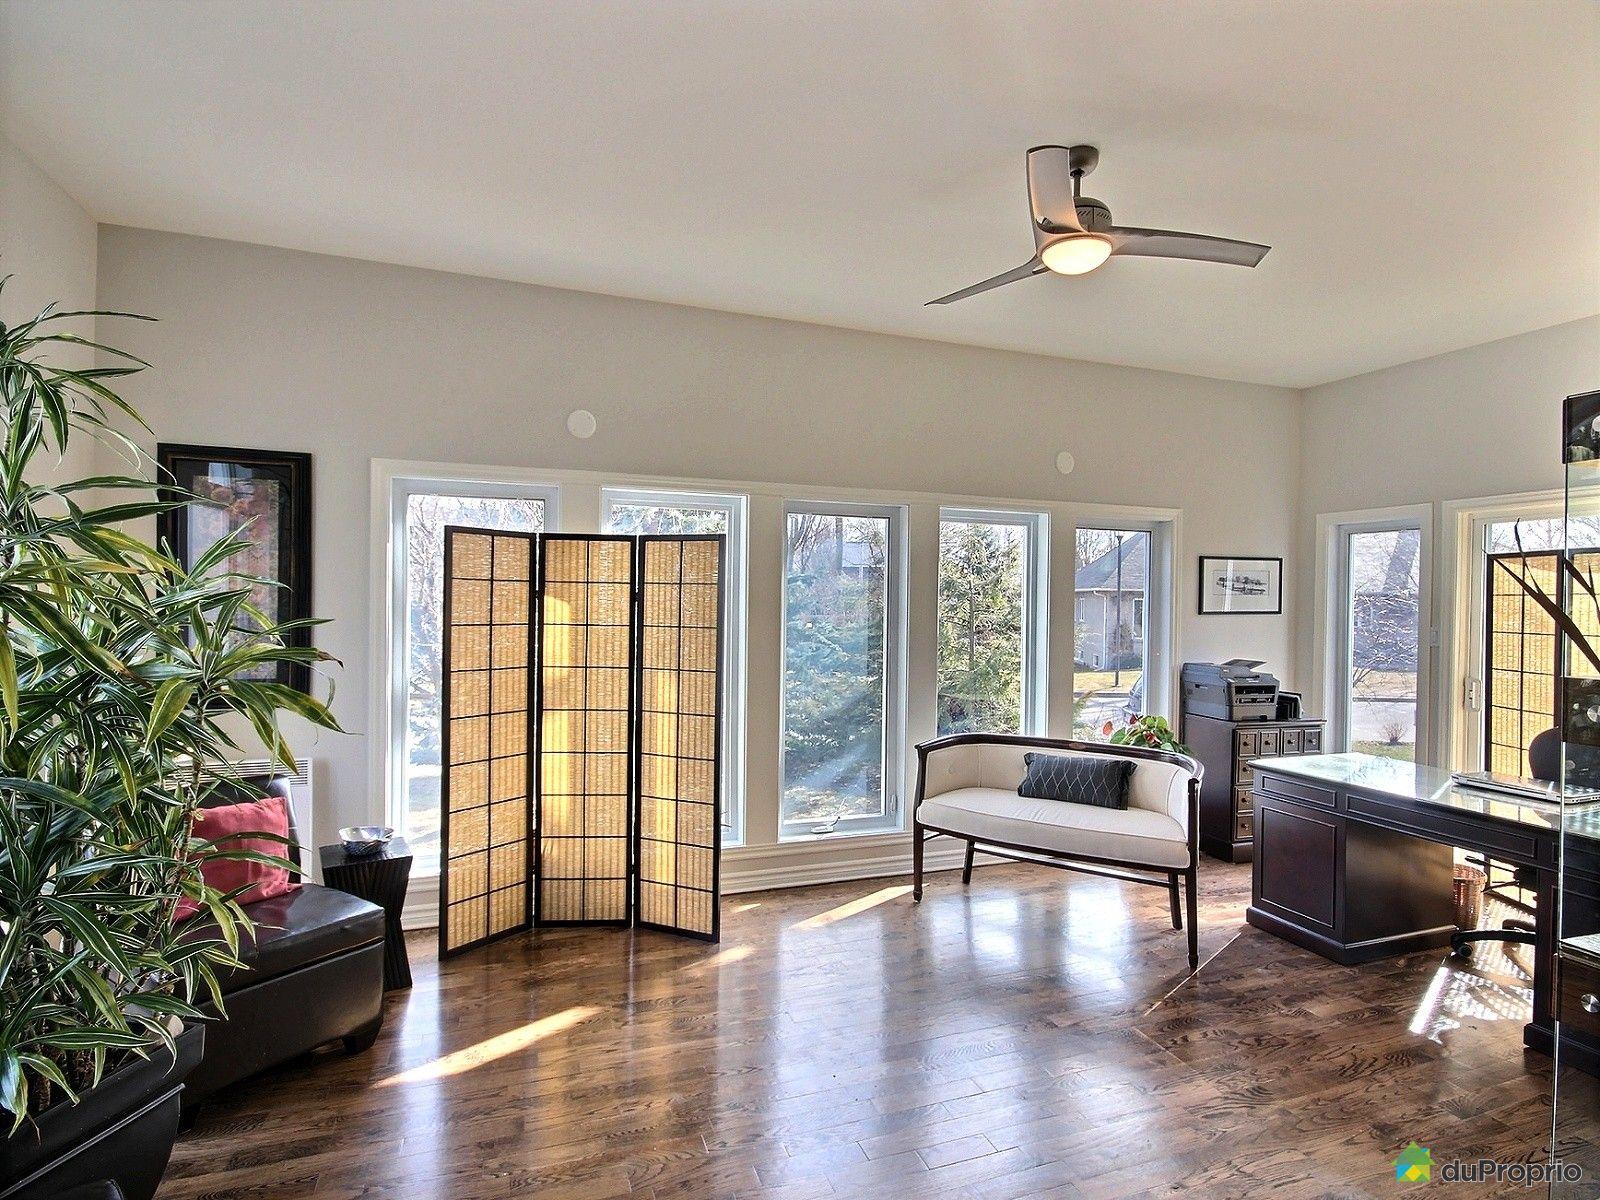 maison vendre salaberry de valleyfield 34 rue de l 39 rabli re immobilier qu bec duproprio. Black Bedroom Furniture Sets. Home Design Ideas